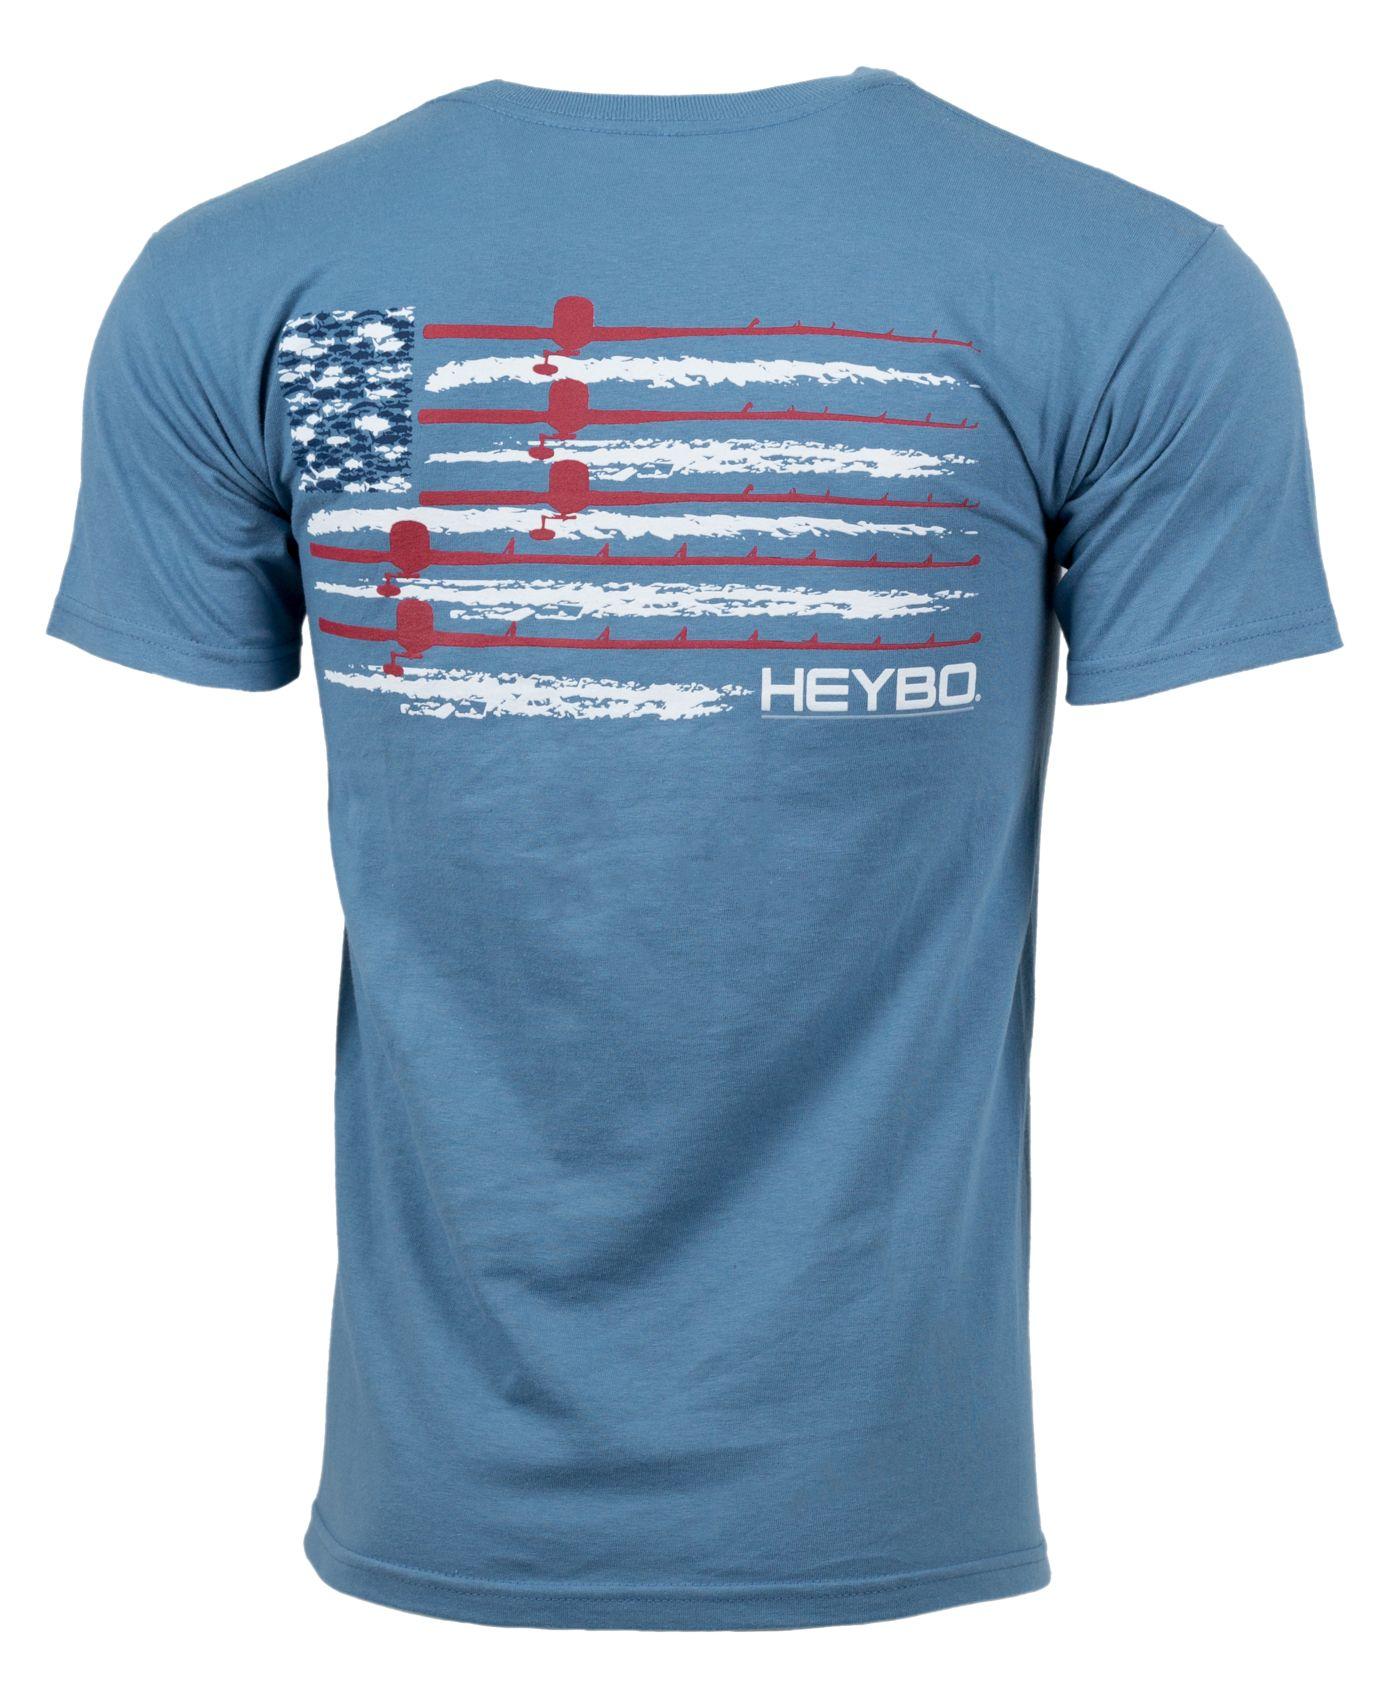 Heybo Men's USA Flag T-Shirt